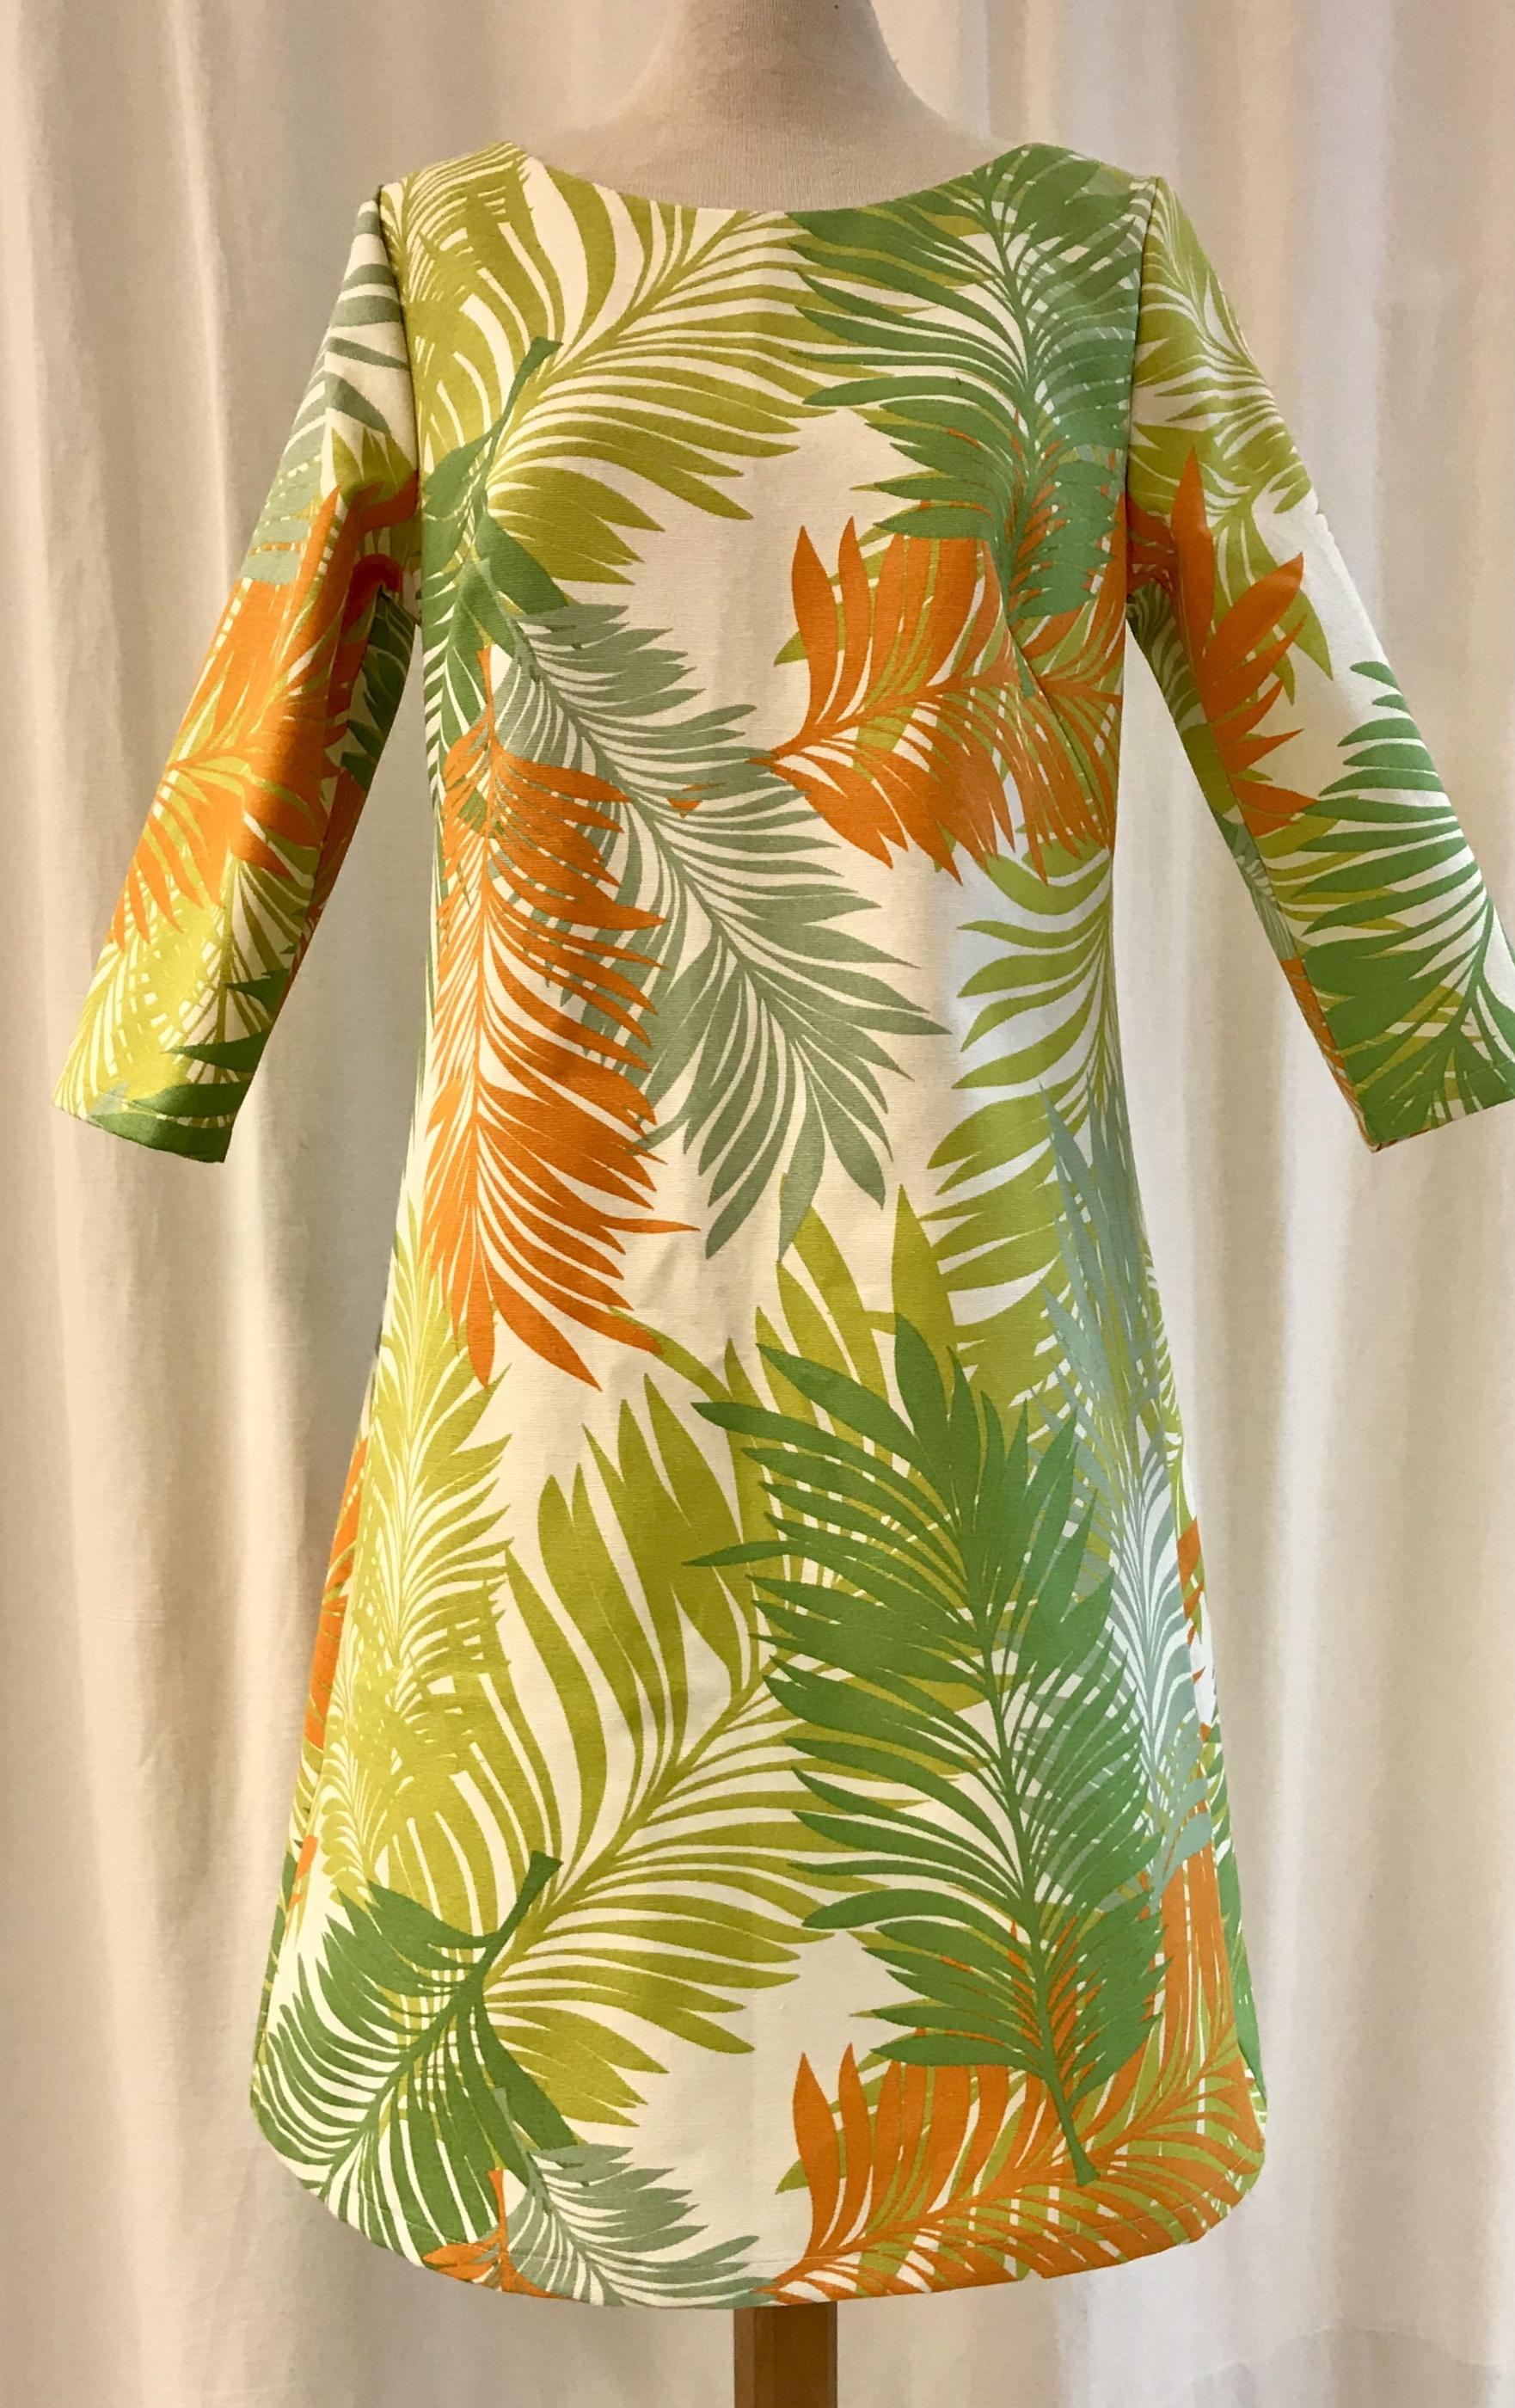 solbritt SaraLaholm klänning orange grön djungel mode unik design